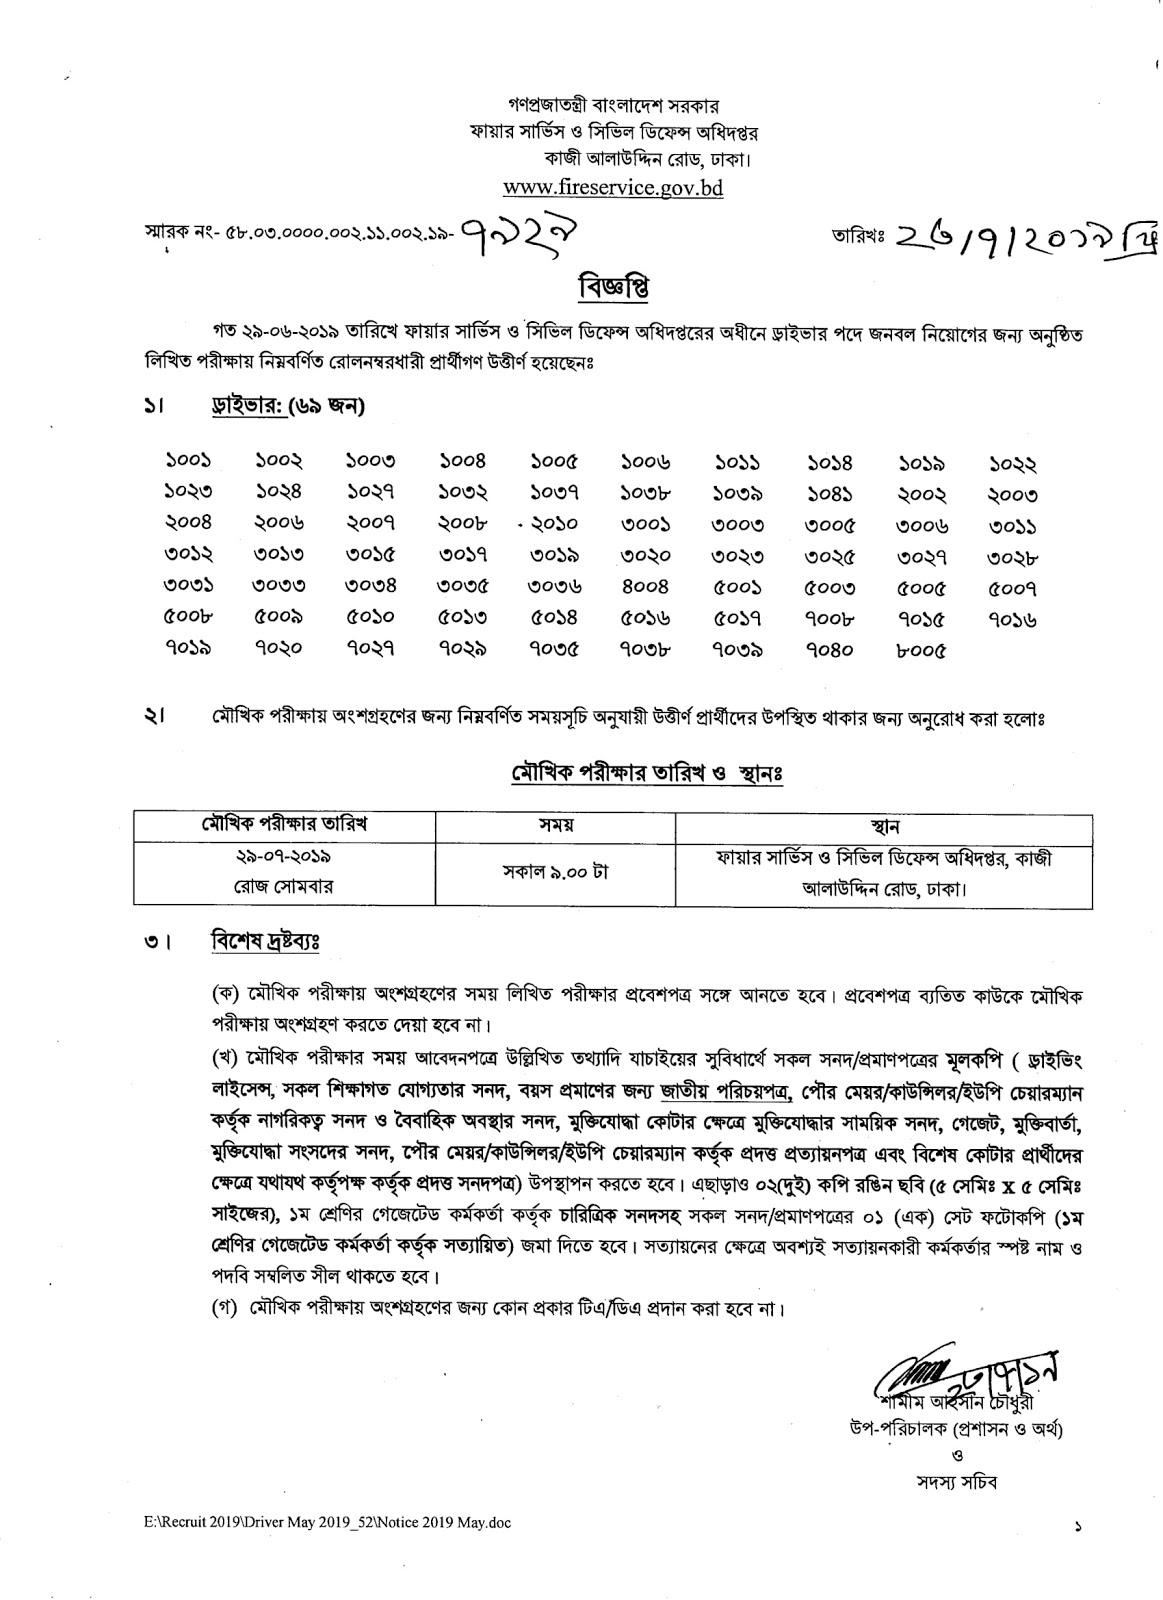 Bangladesh Fire Service Job Result 2019